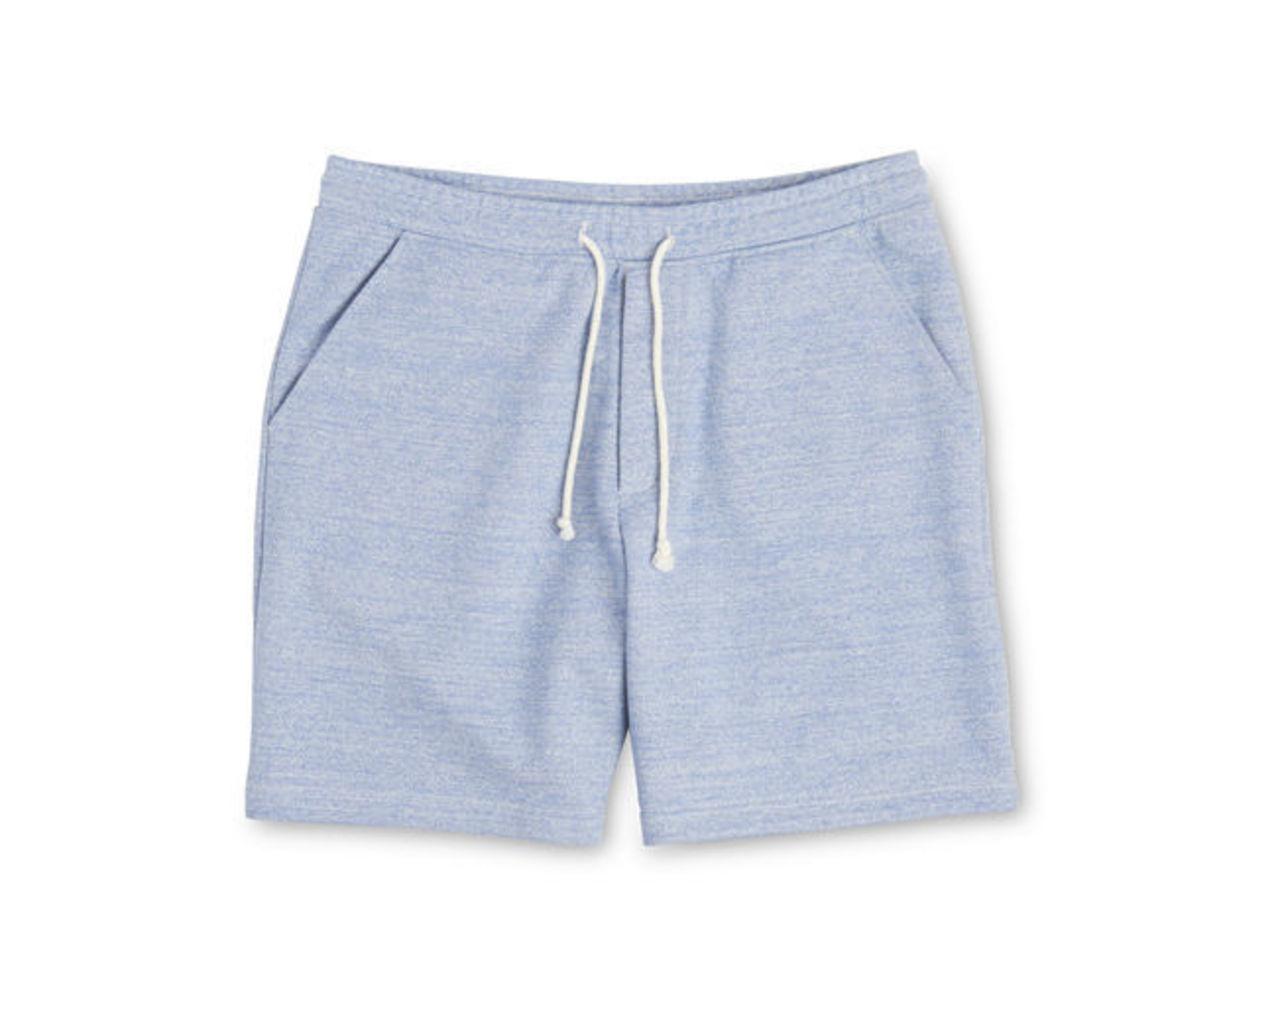 Marl Sweat Shorts